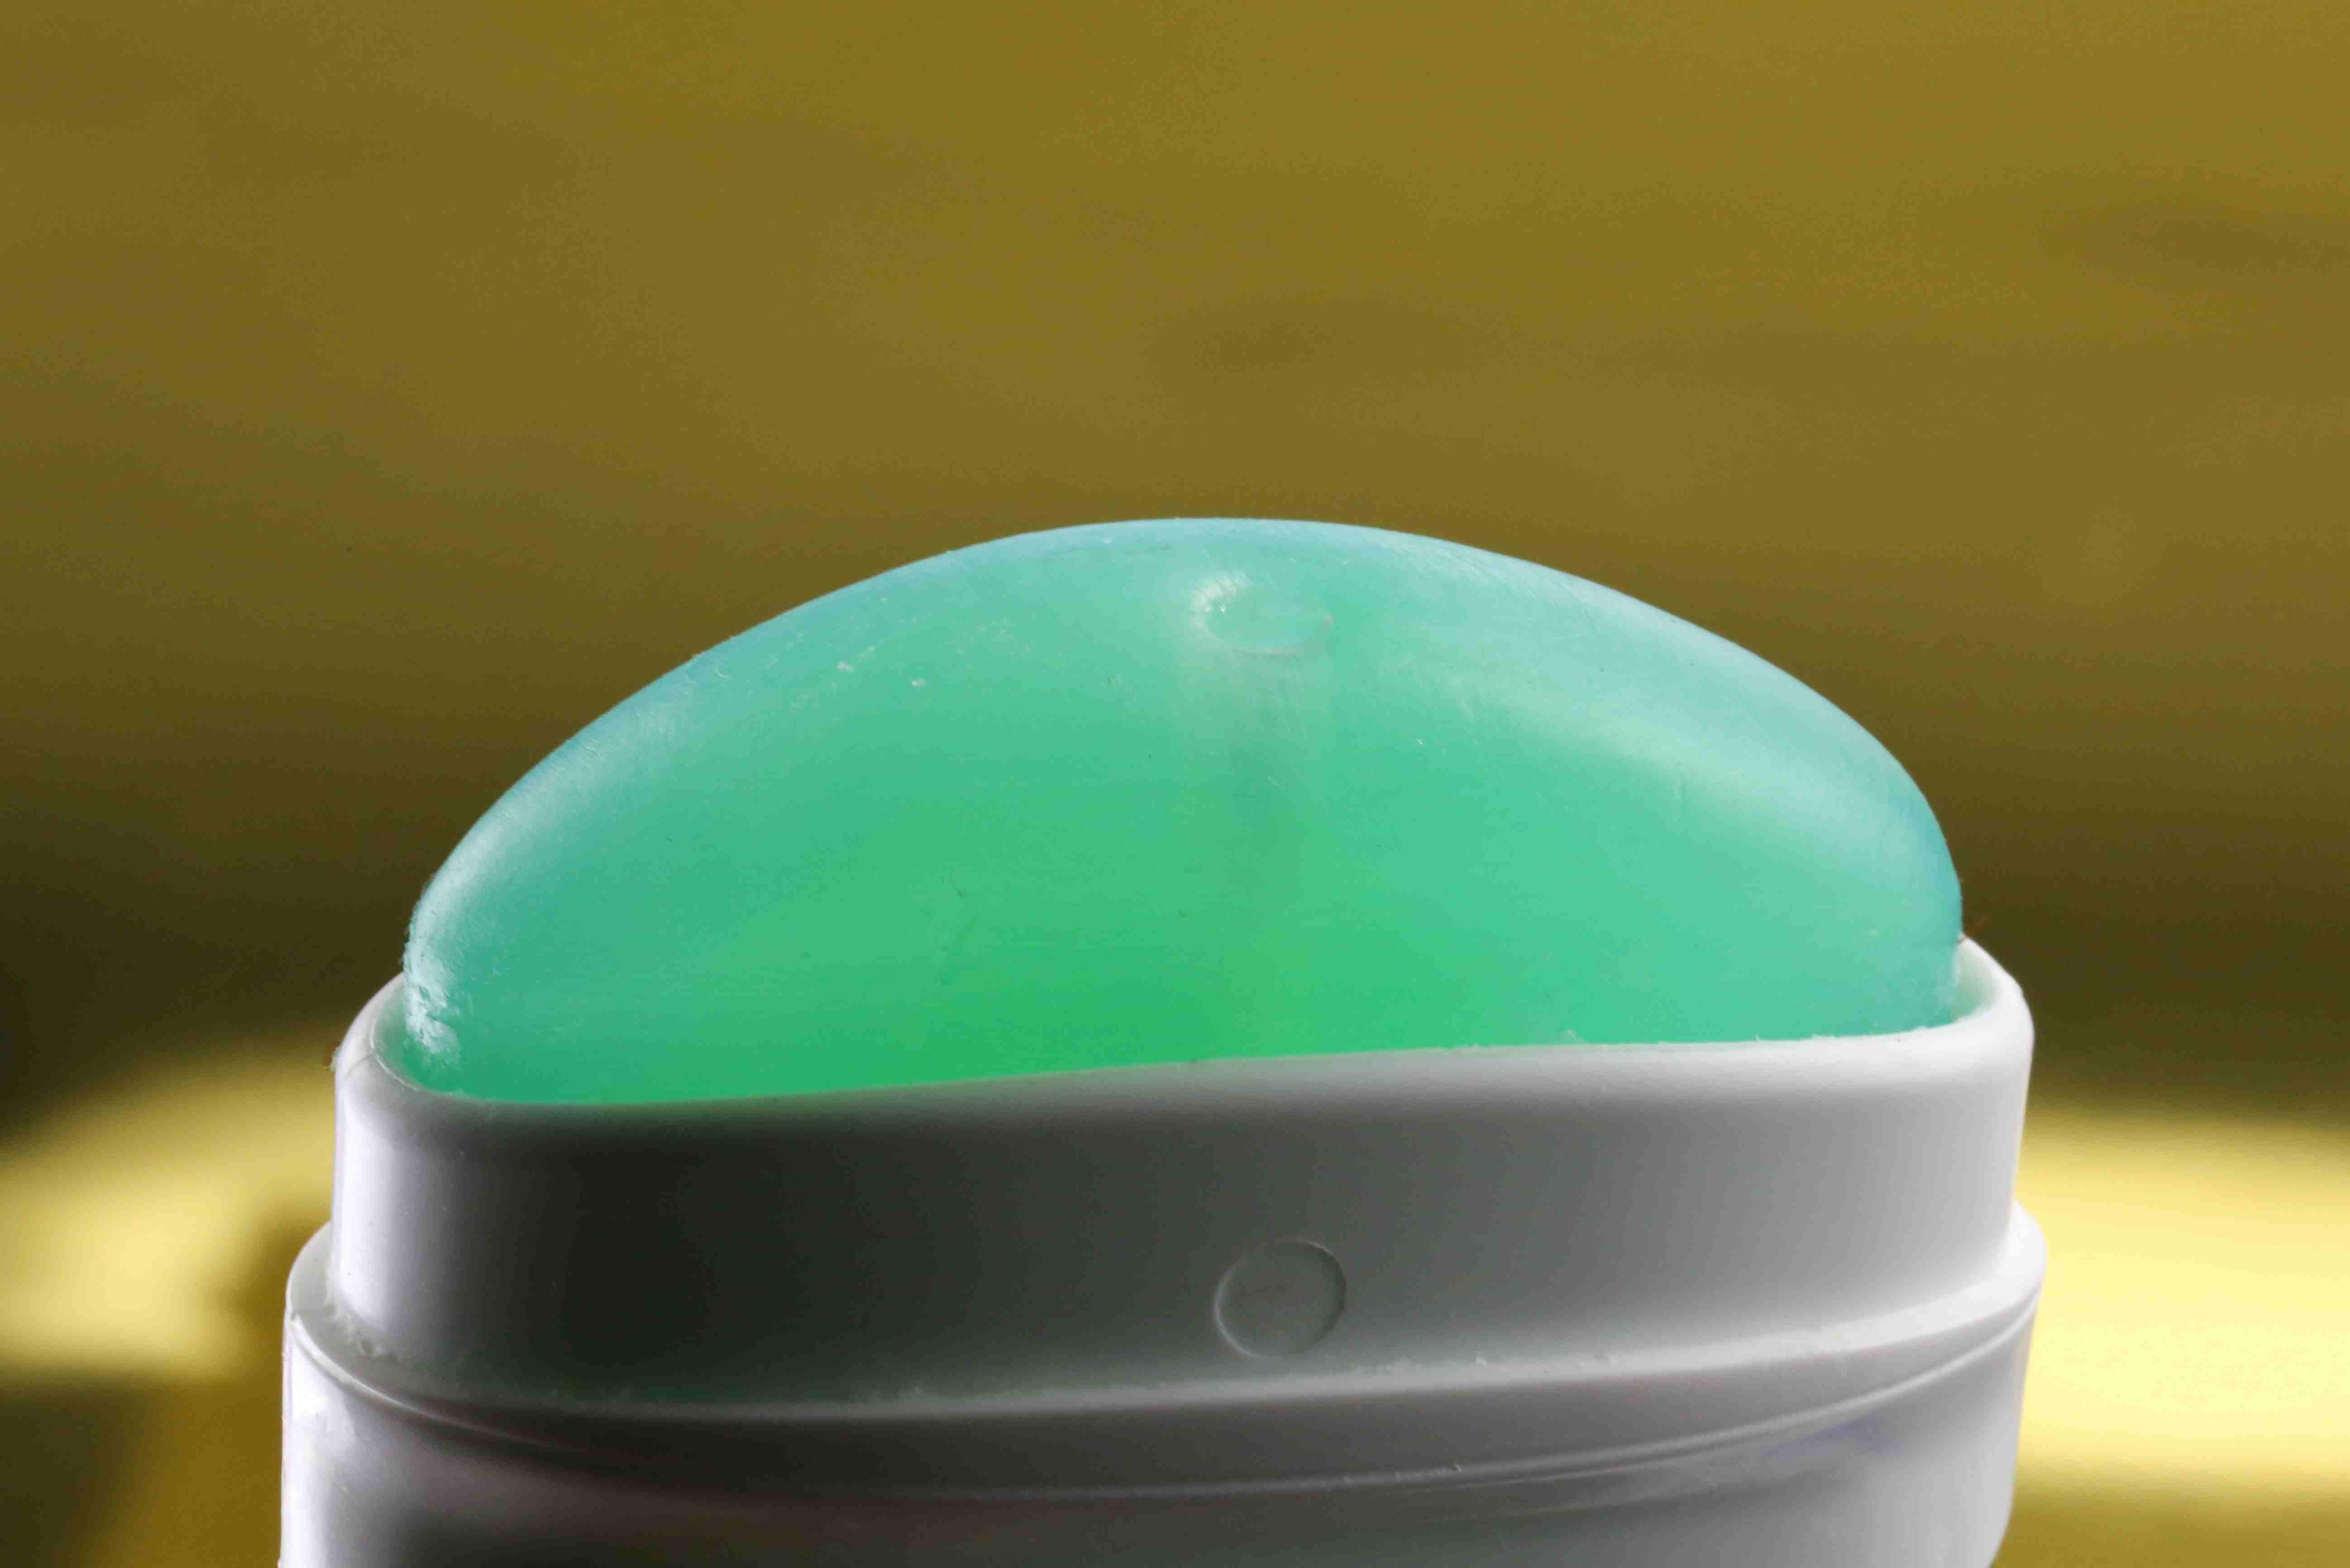 Refreshing deodorant for hygiene